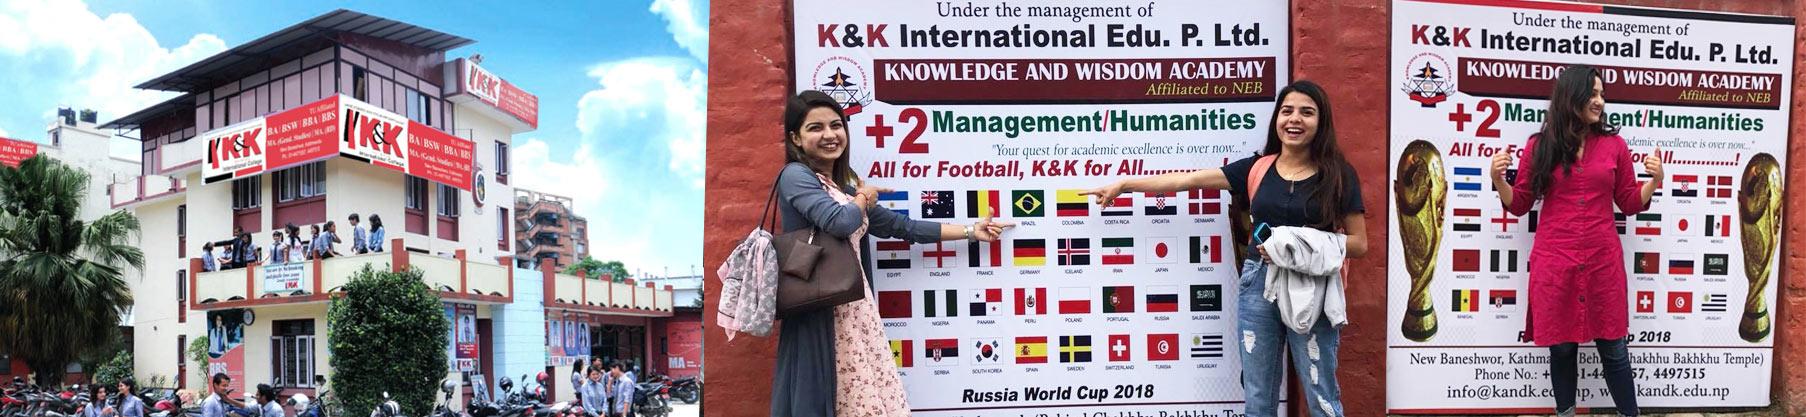 Knowledge and Wisdom Academy Secondary School